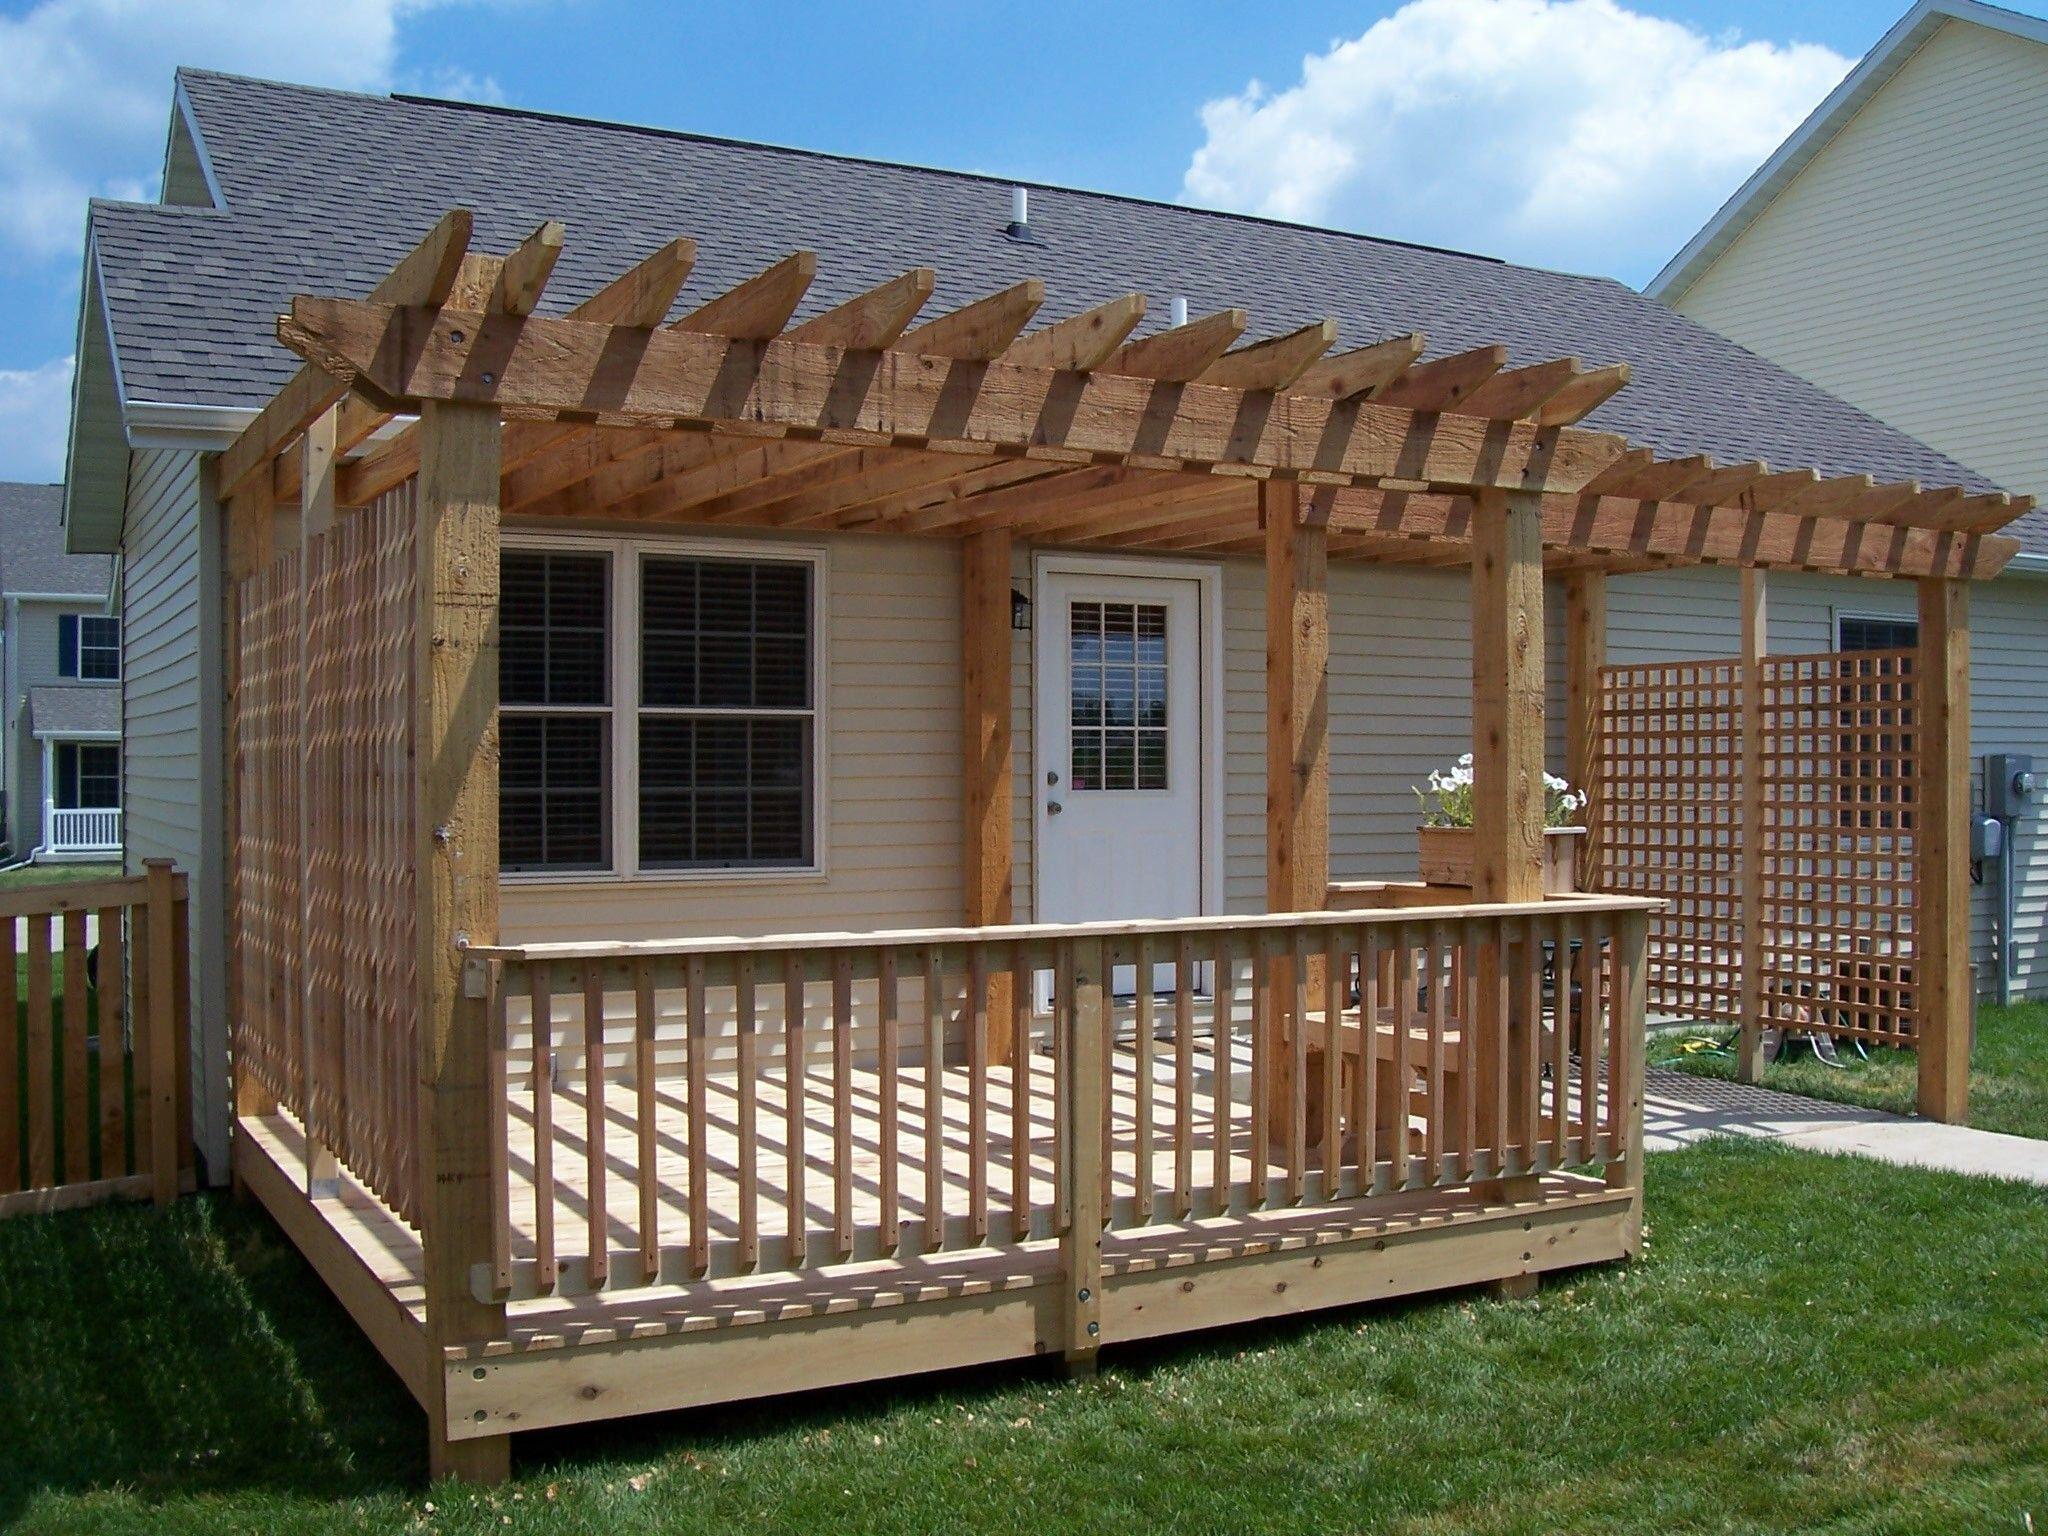 Pergola Over Deck Deck With Pergola Backyard Pergola Backyard Backyard deck ideas not attached to house